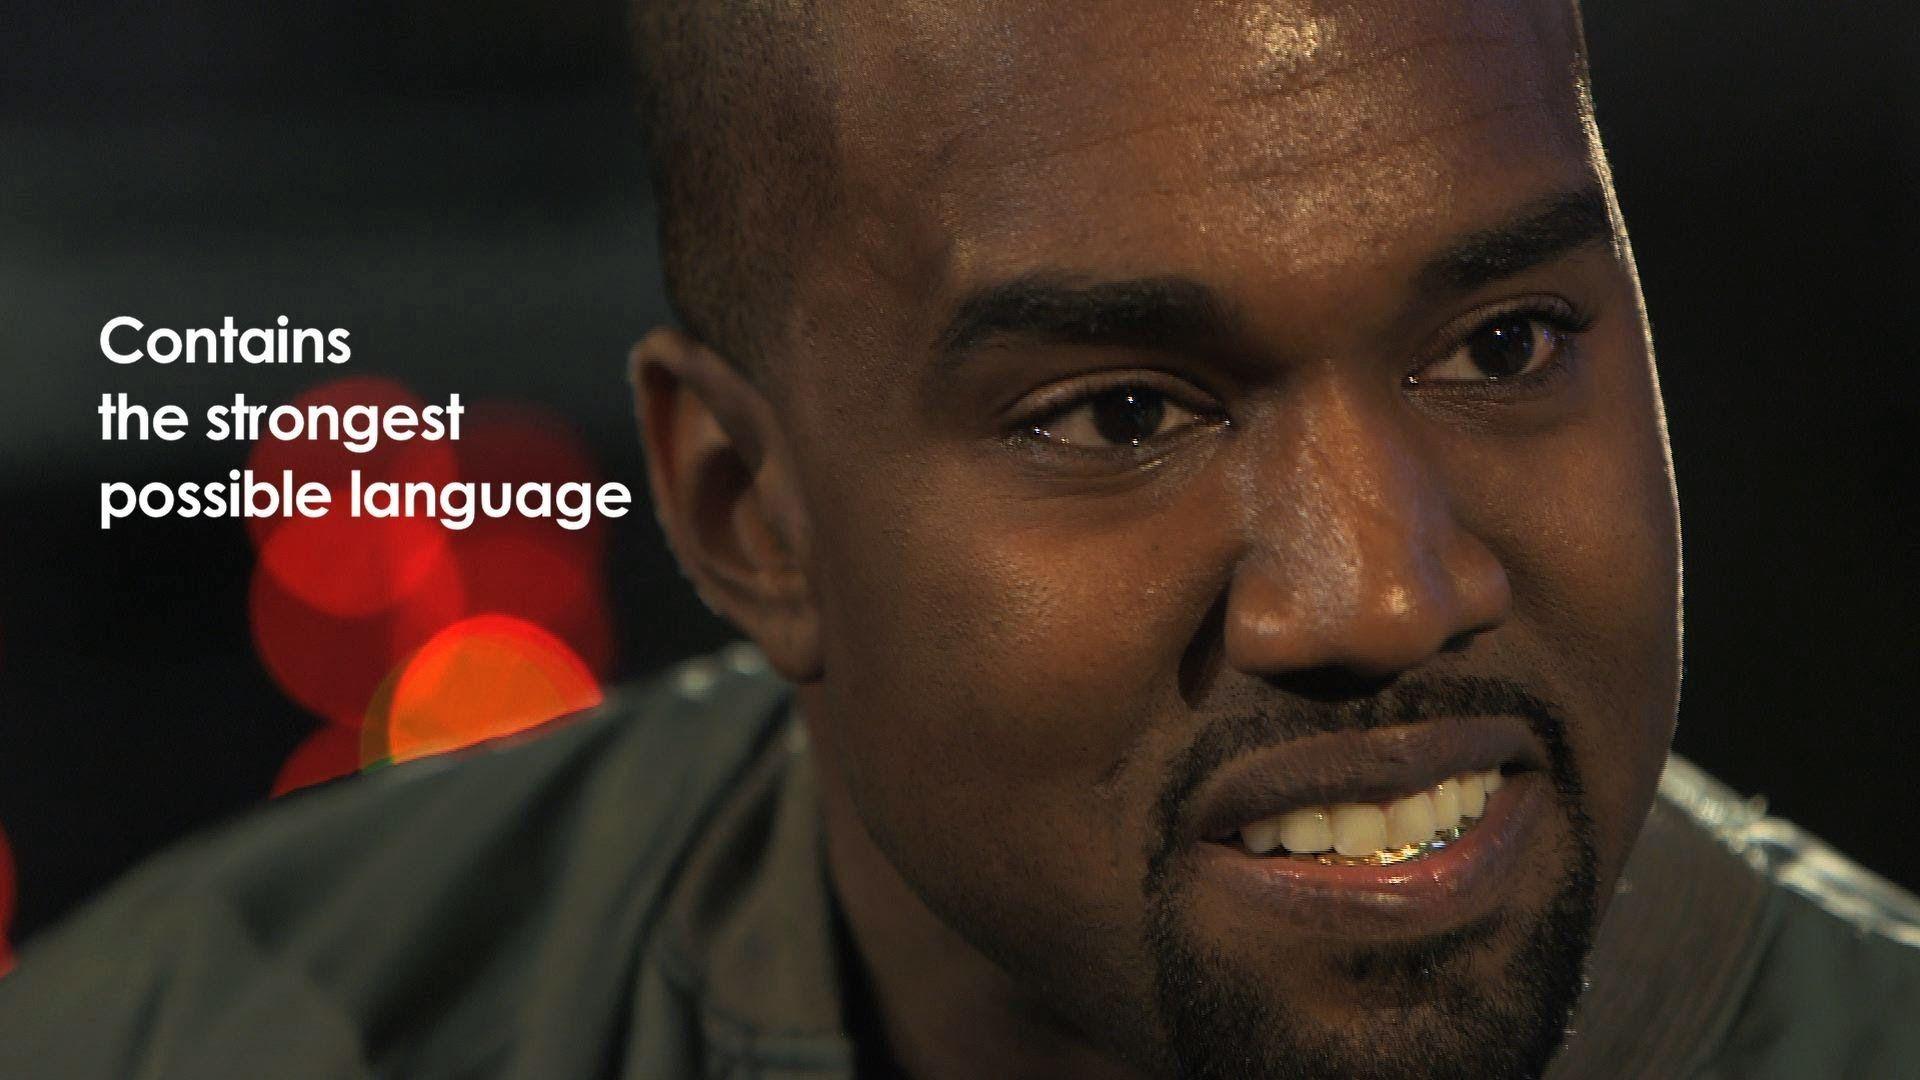 Kanye West On Self Esteem Reasons Why He Is My Favorite Artist Kanye West Funny Best Of Kanye West Kanye West